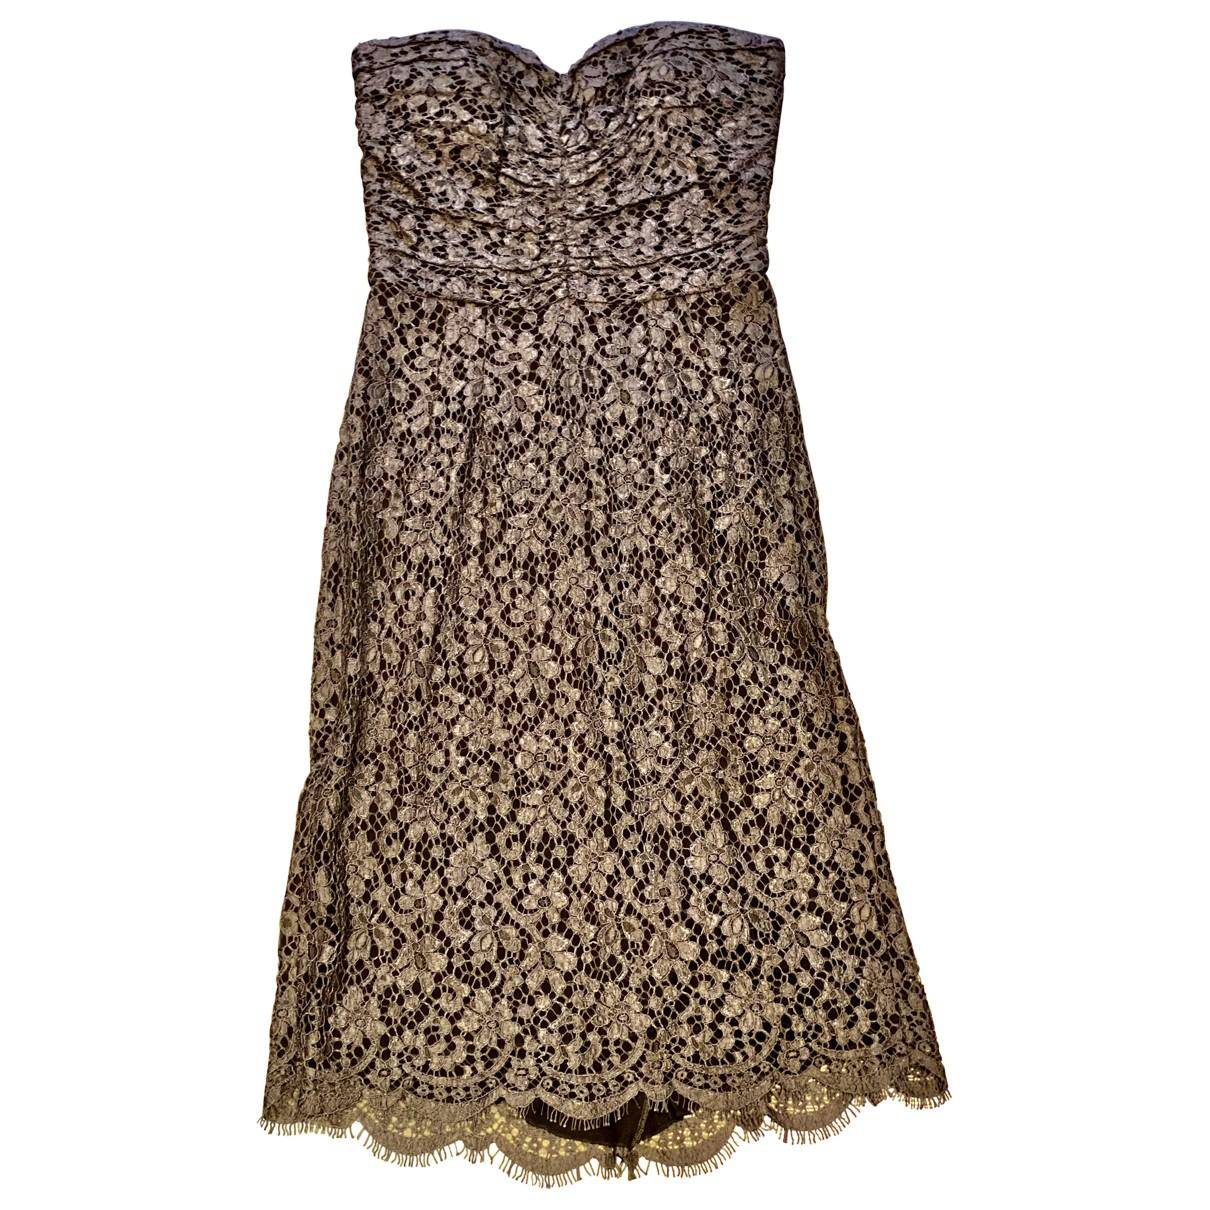 Dolce & Gabbana \N Kleid in  Grau Baumwolle